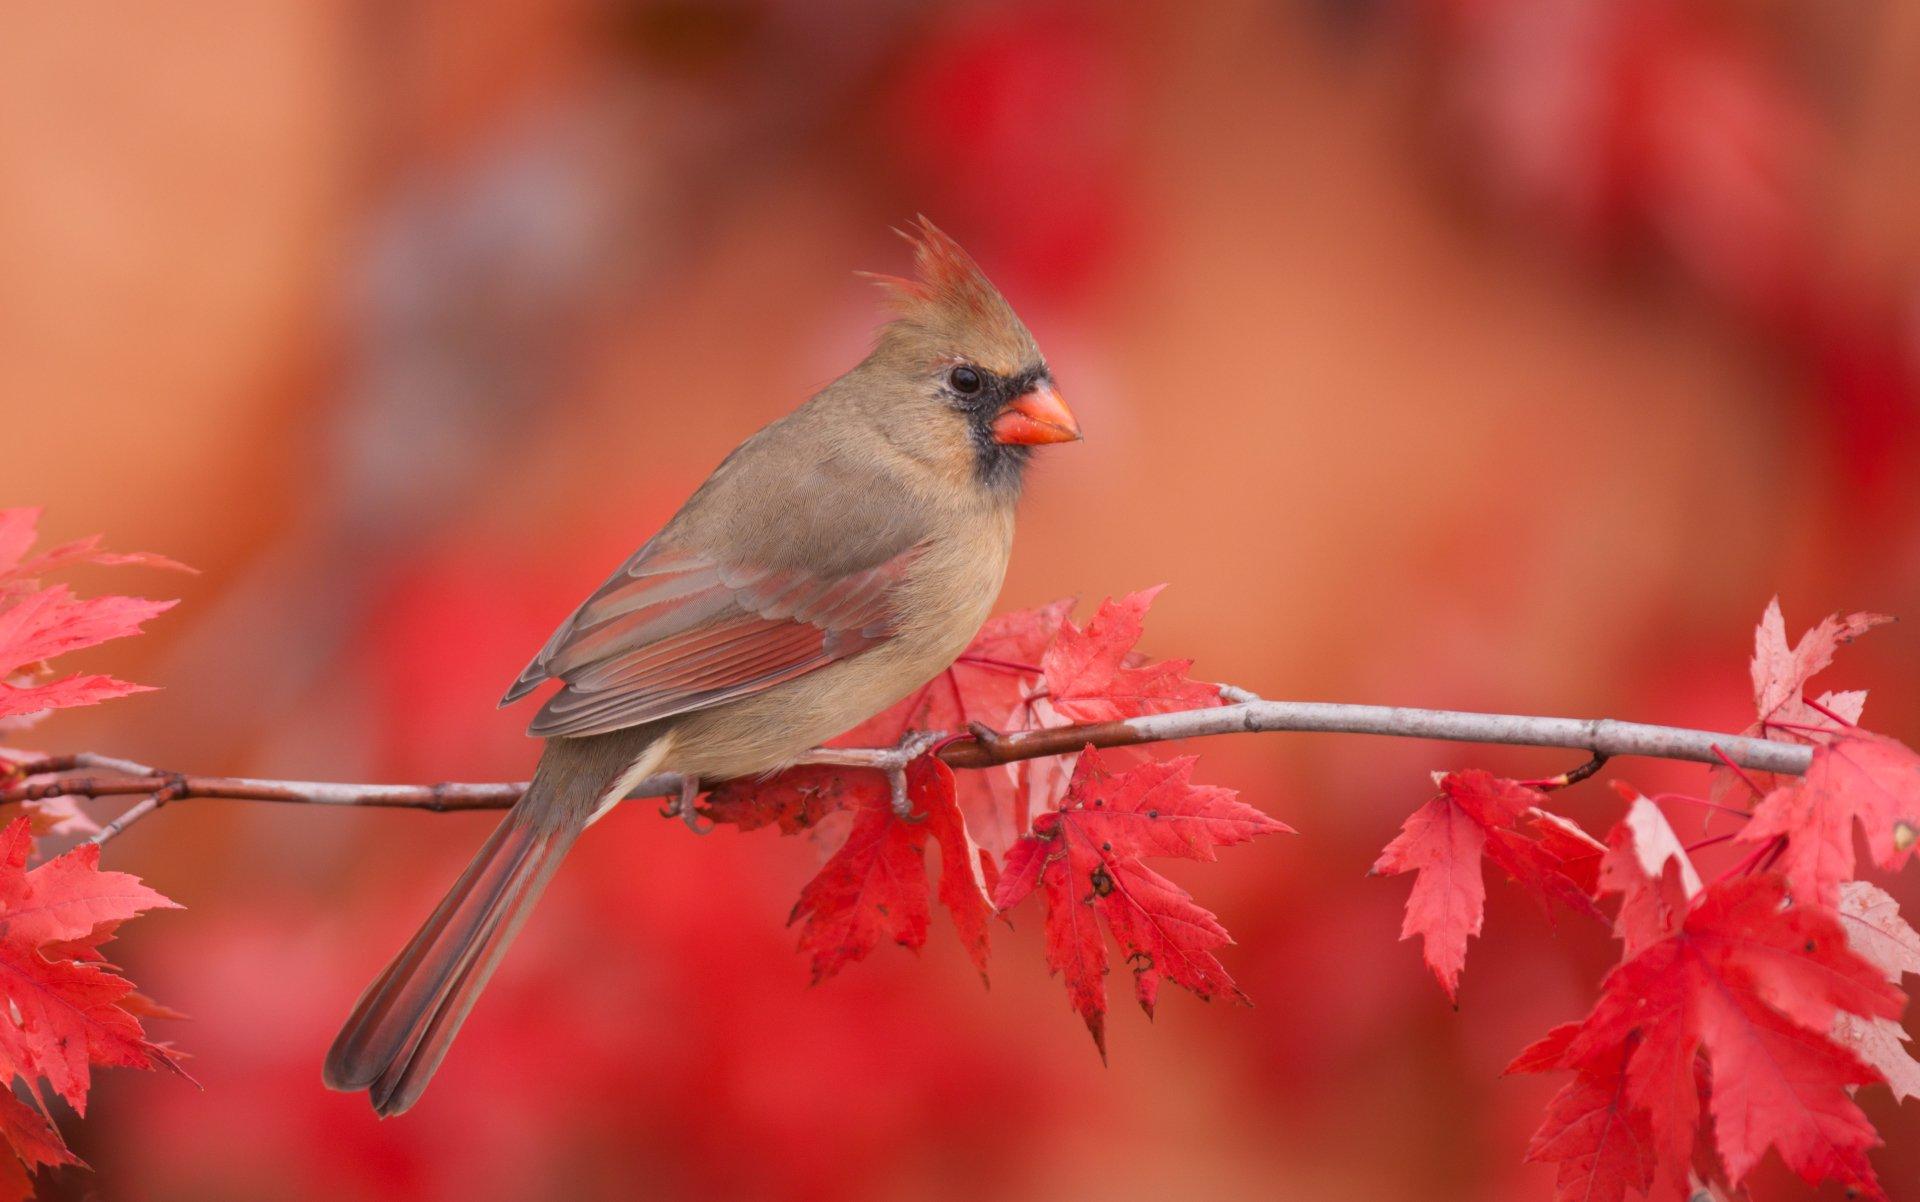 Female Northern Cardinal 4k Ultra HD Wallpaper